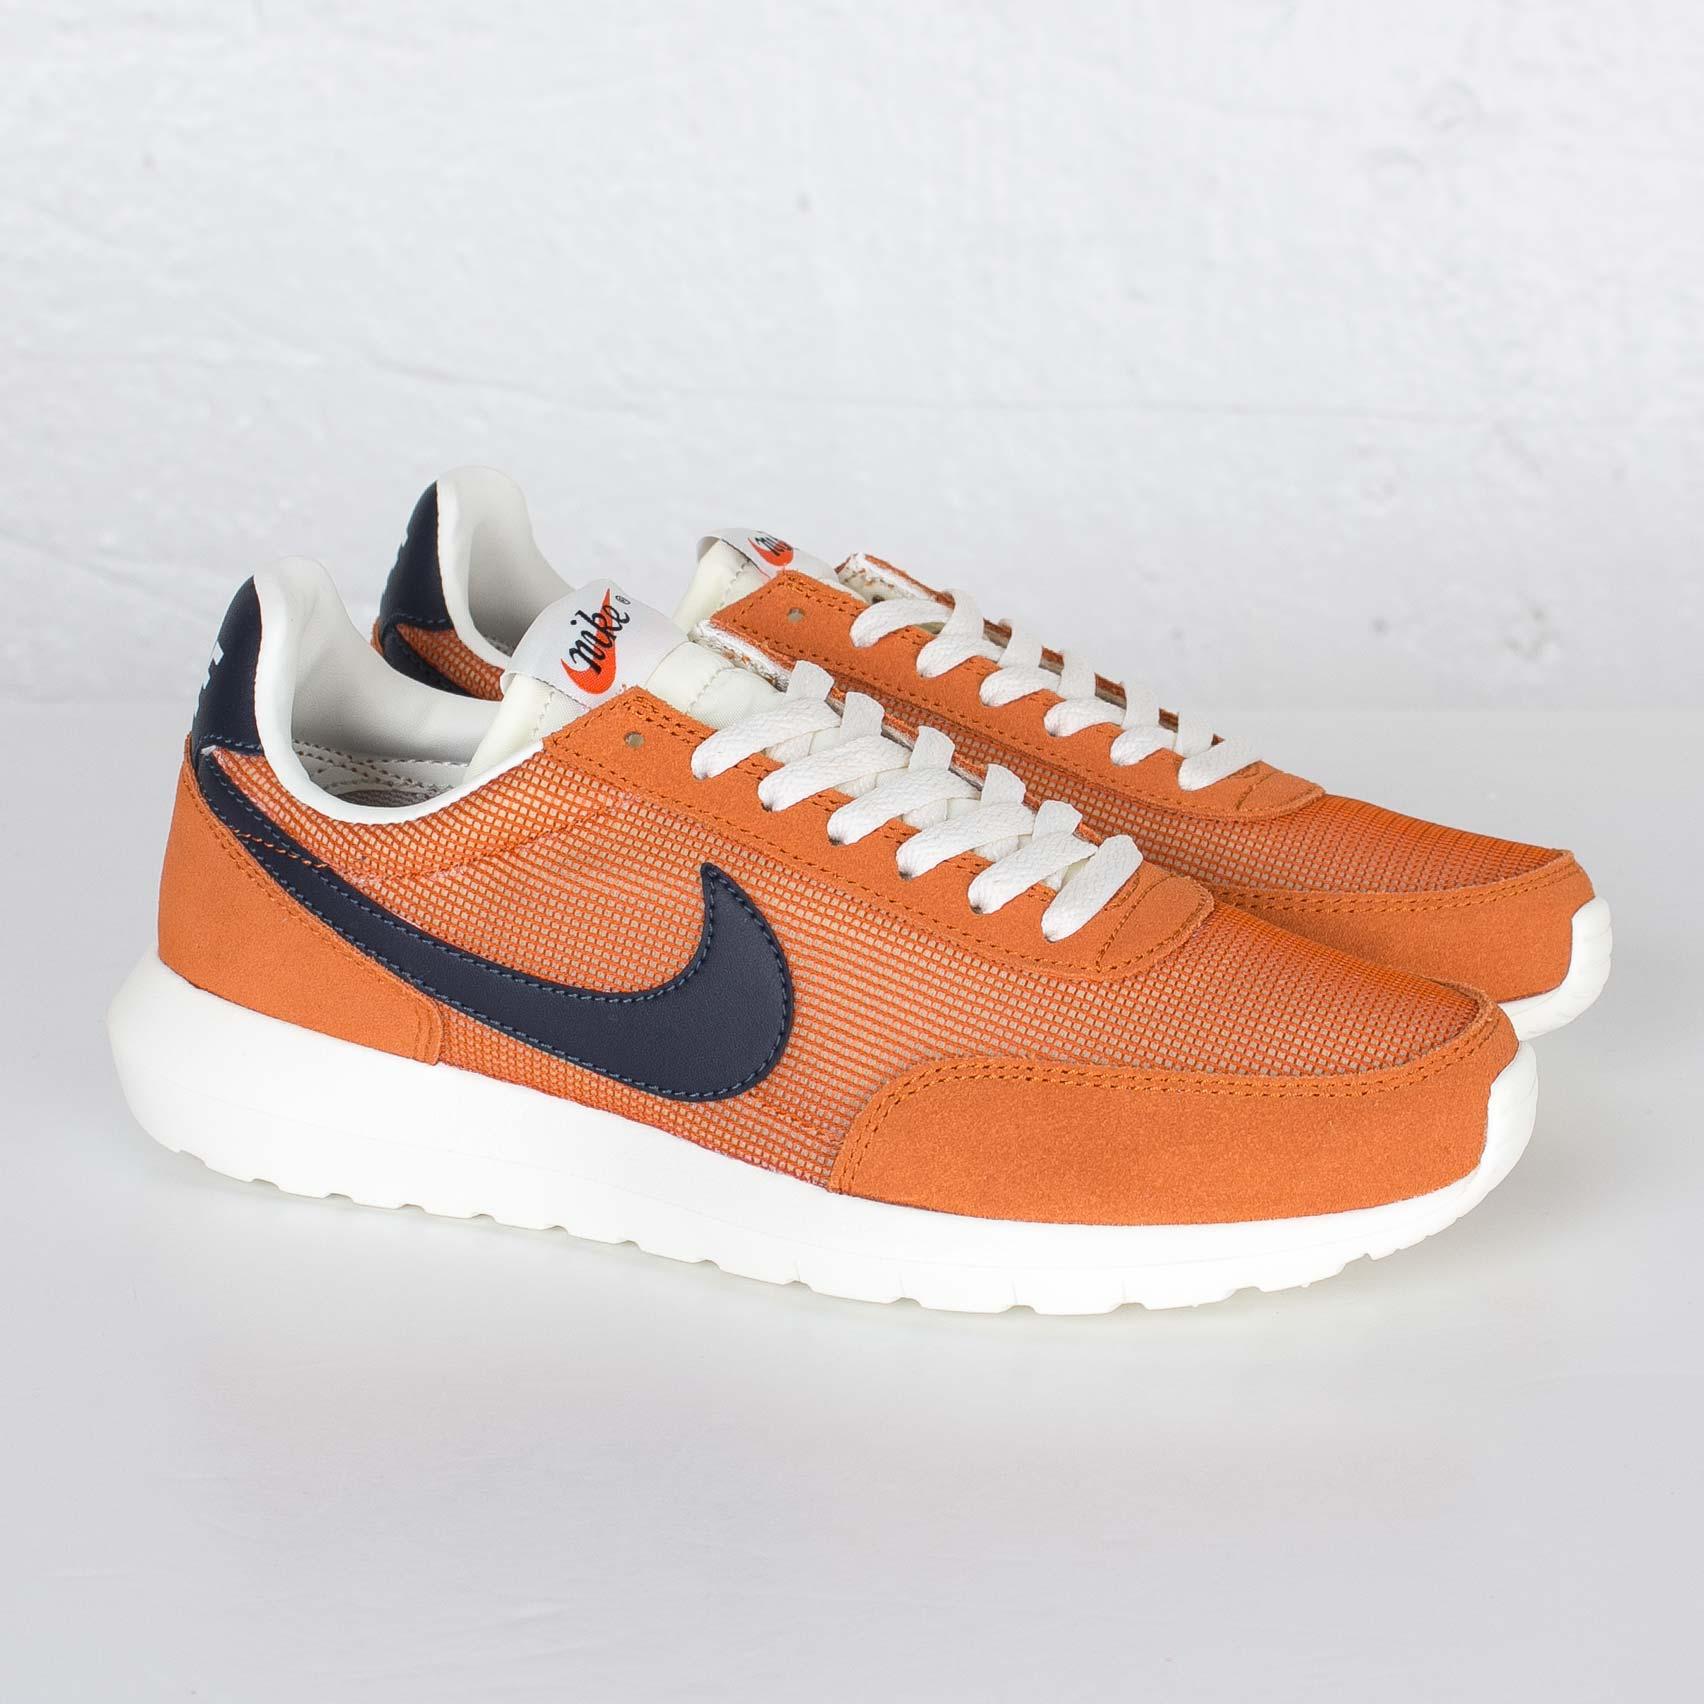 Nike Roshe Daybreak NM 826666 804 Sneakersnstuff